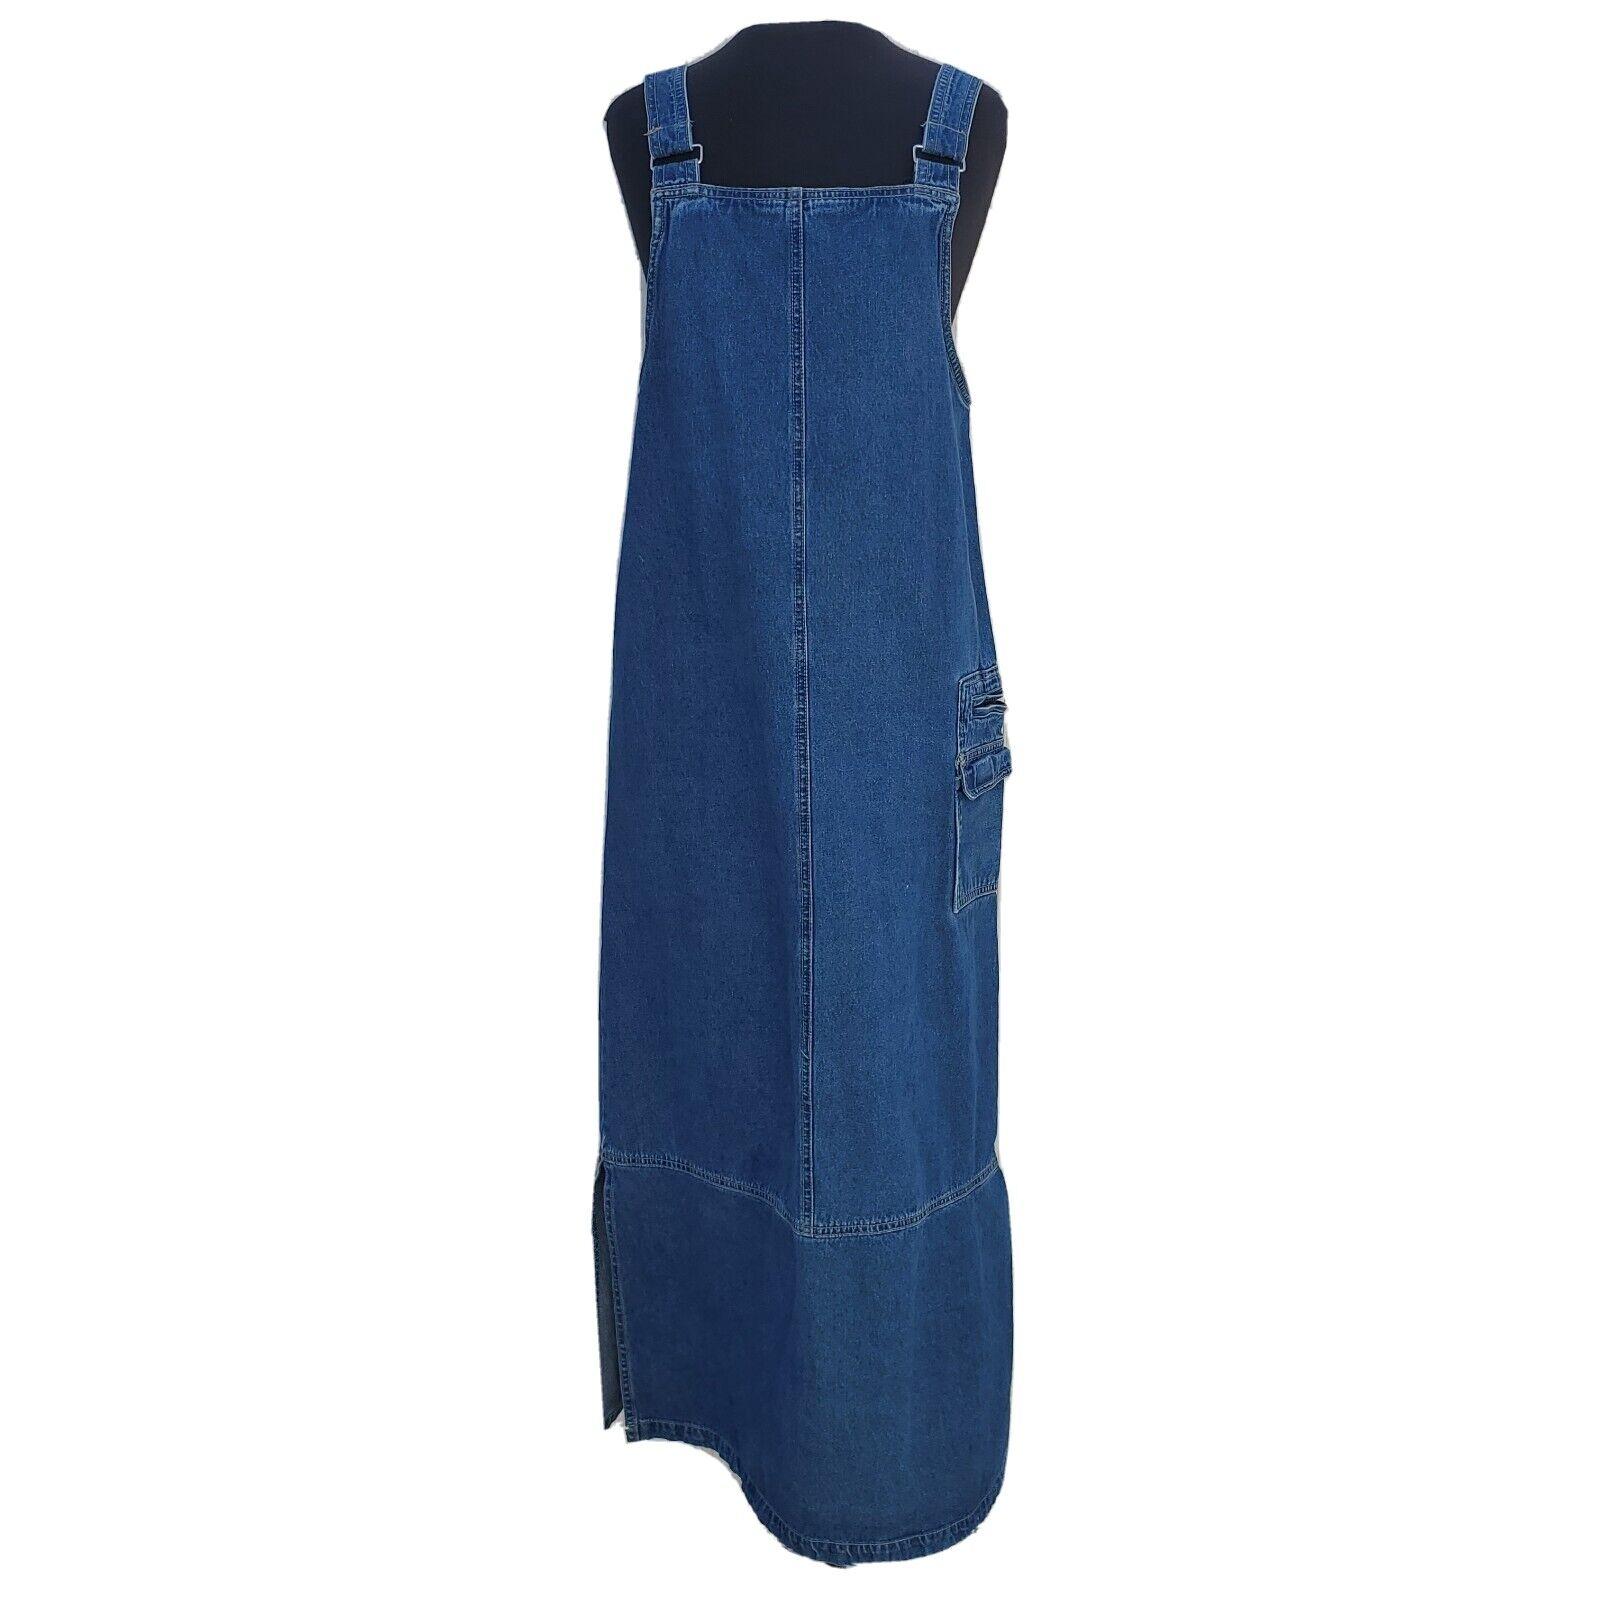 Vintage 90s Denim Bib Apron Maxi Dress Sleeveless… - image 1